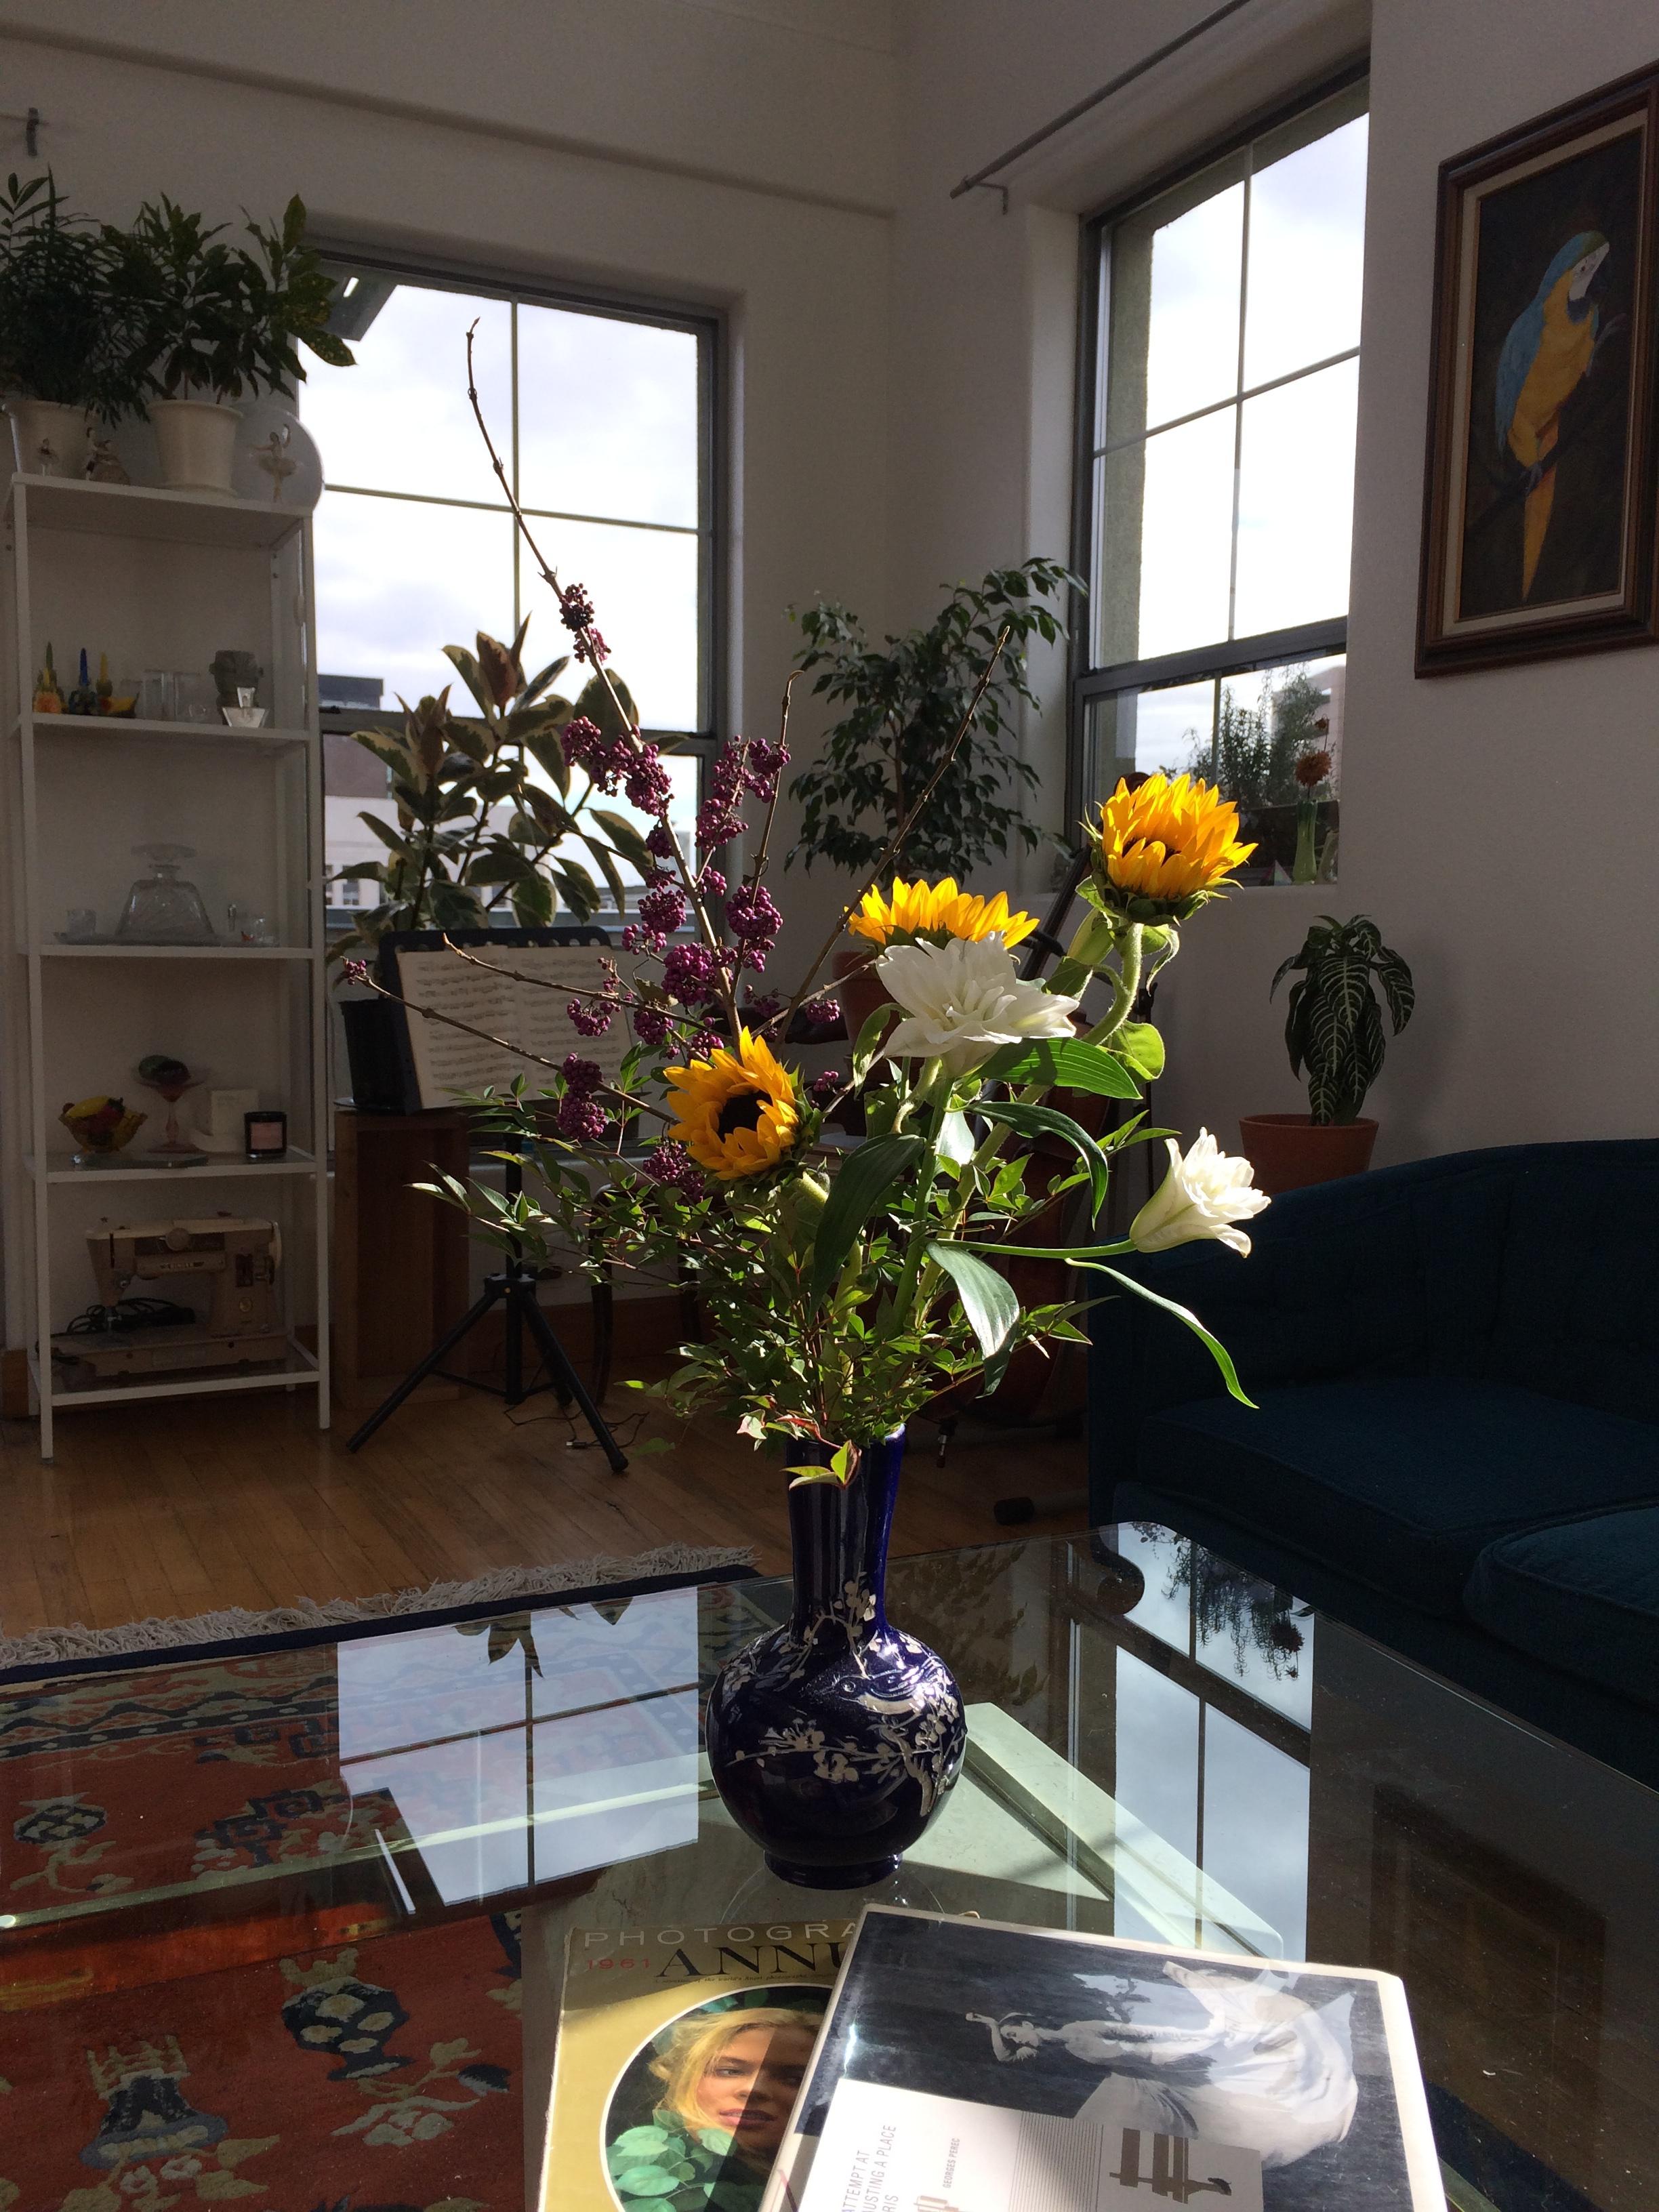 A vase of birthday flowers